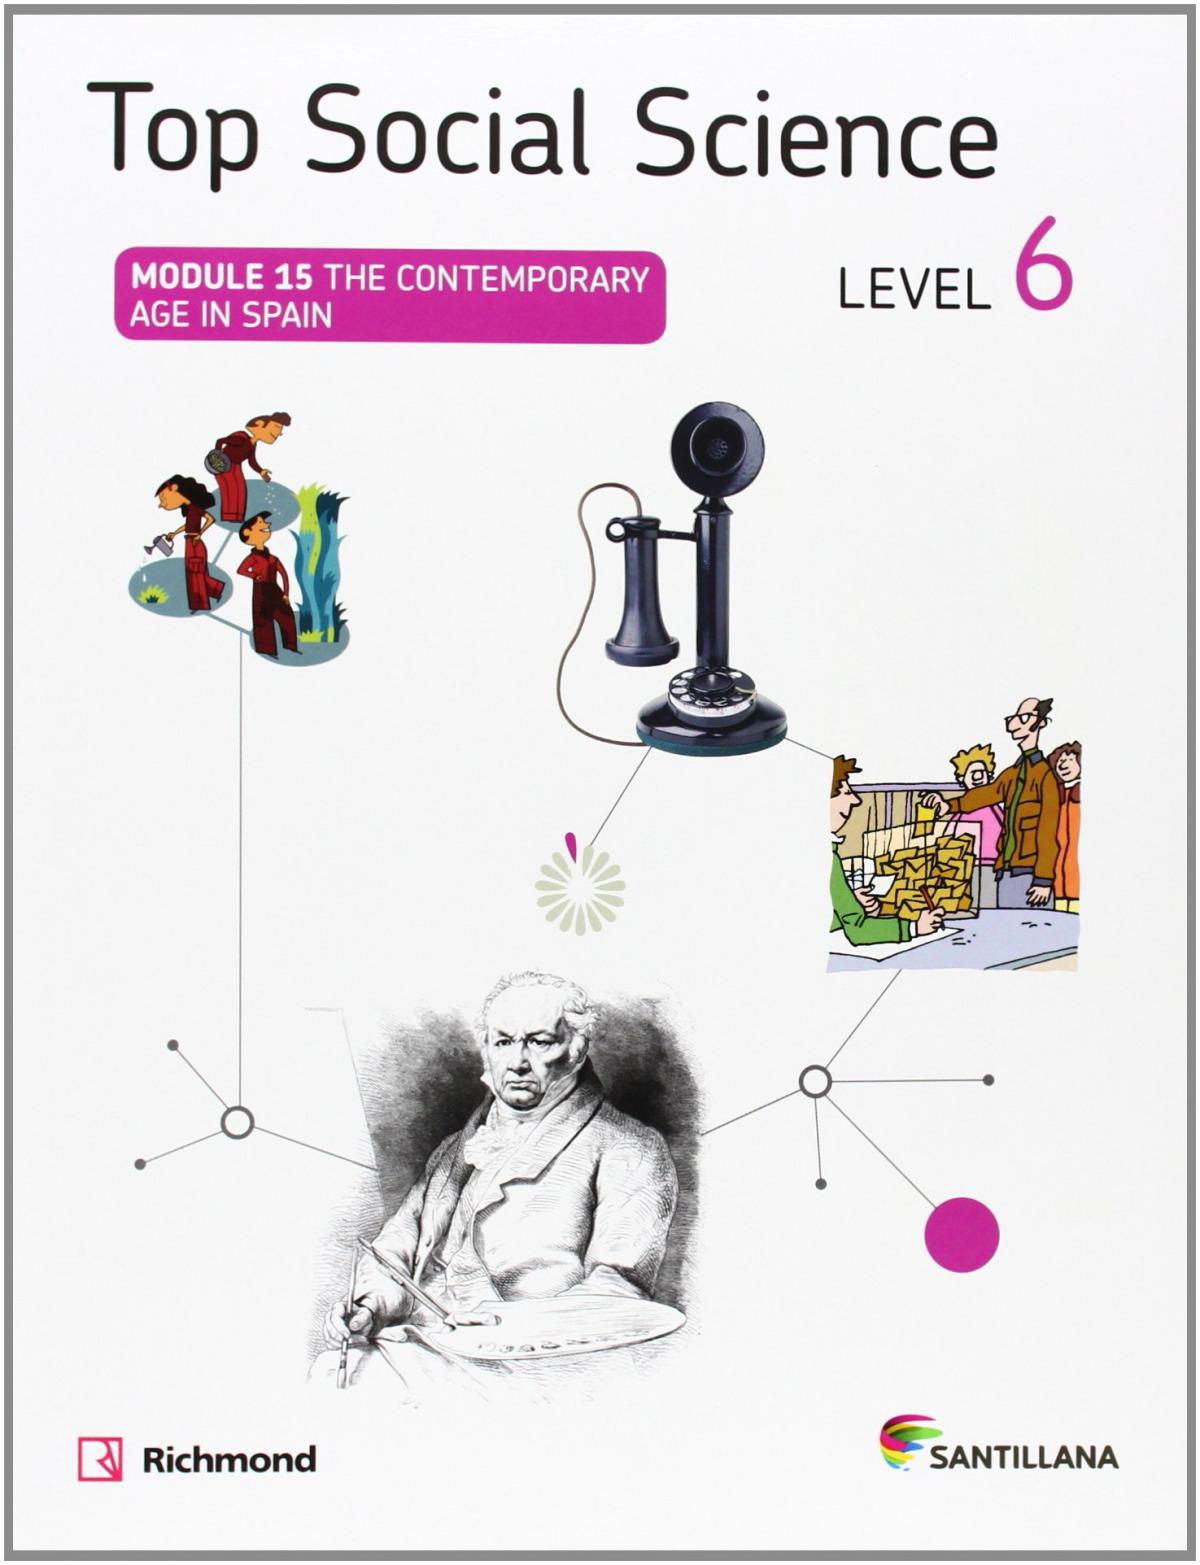 Top social science 6. Contemporary age in Spain